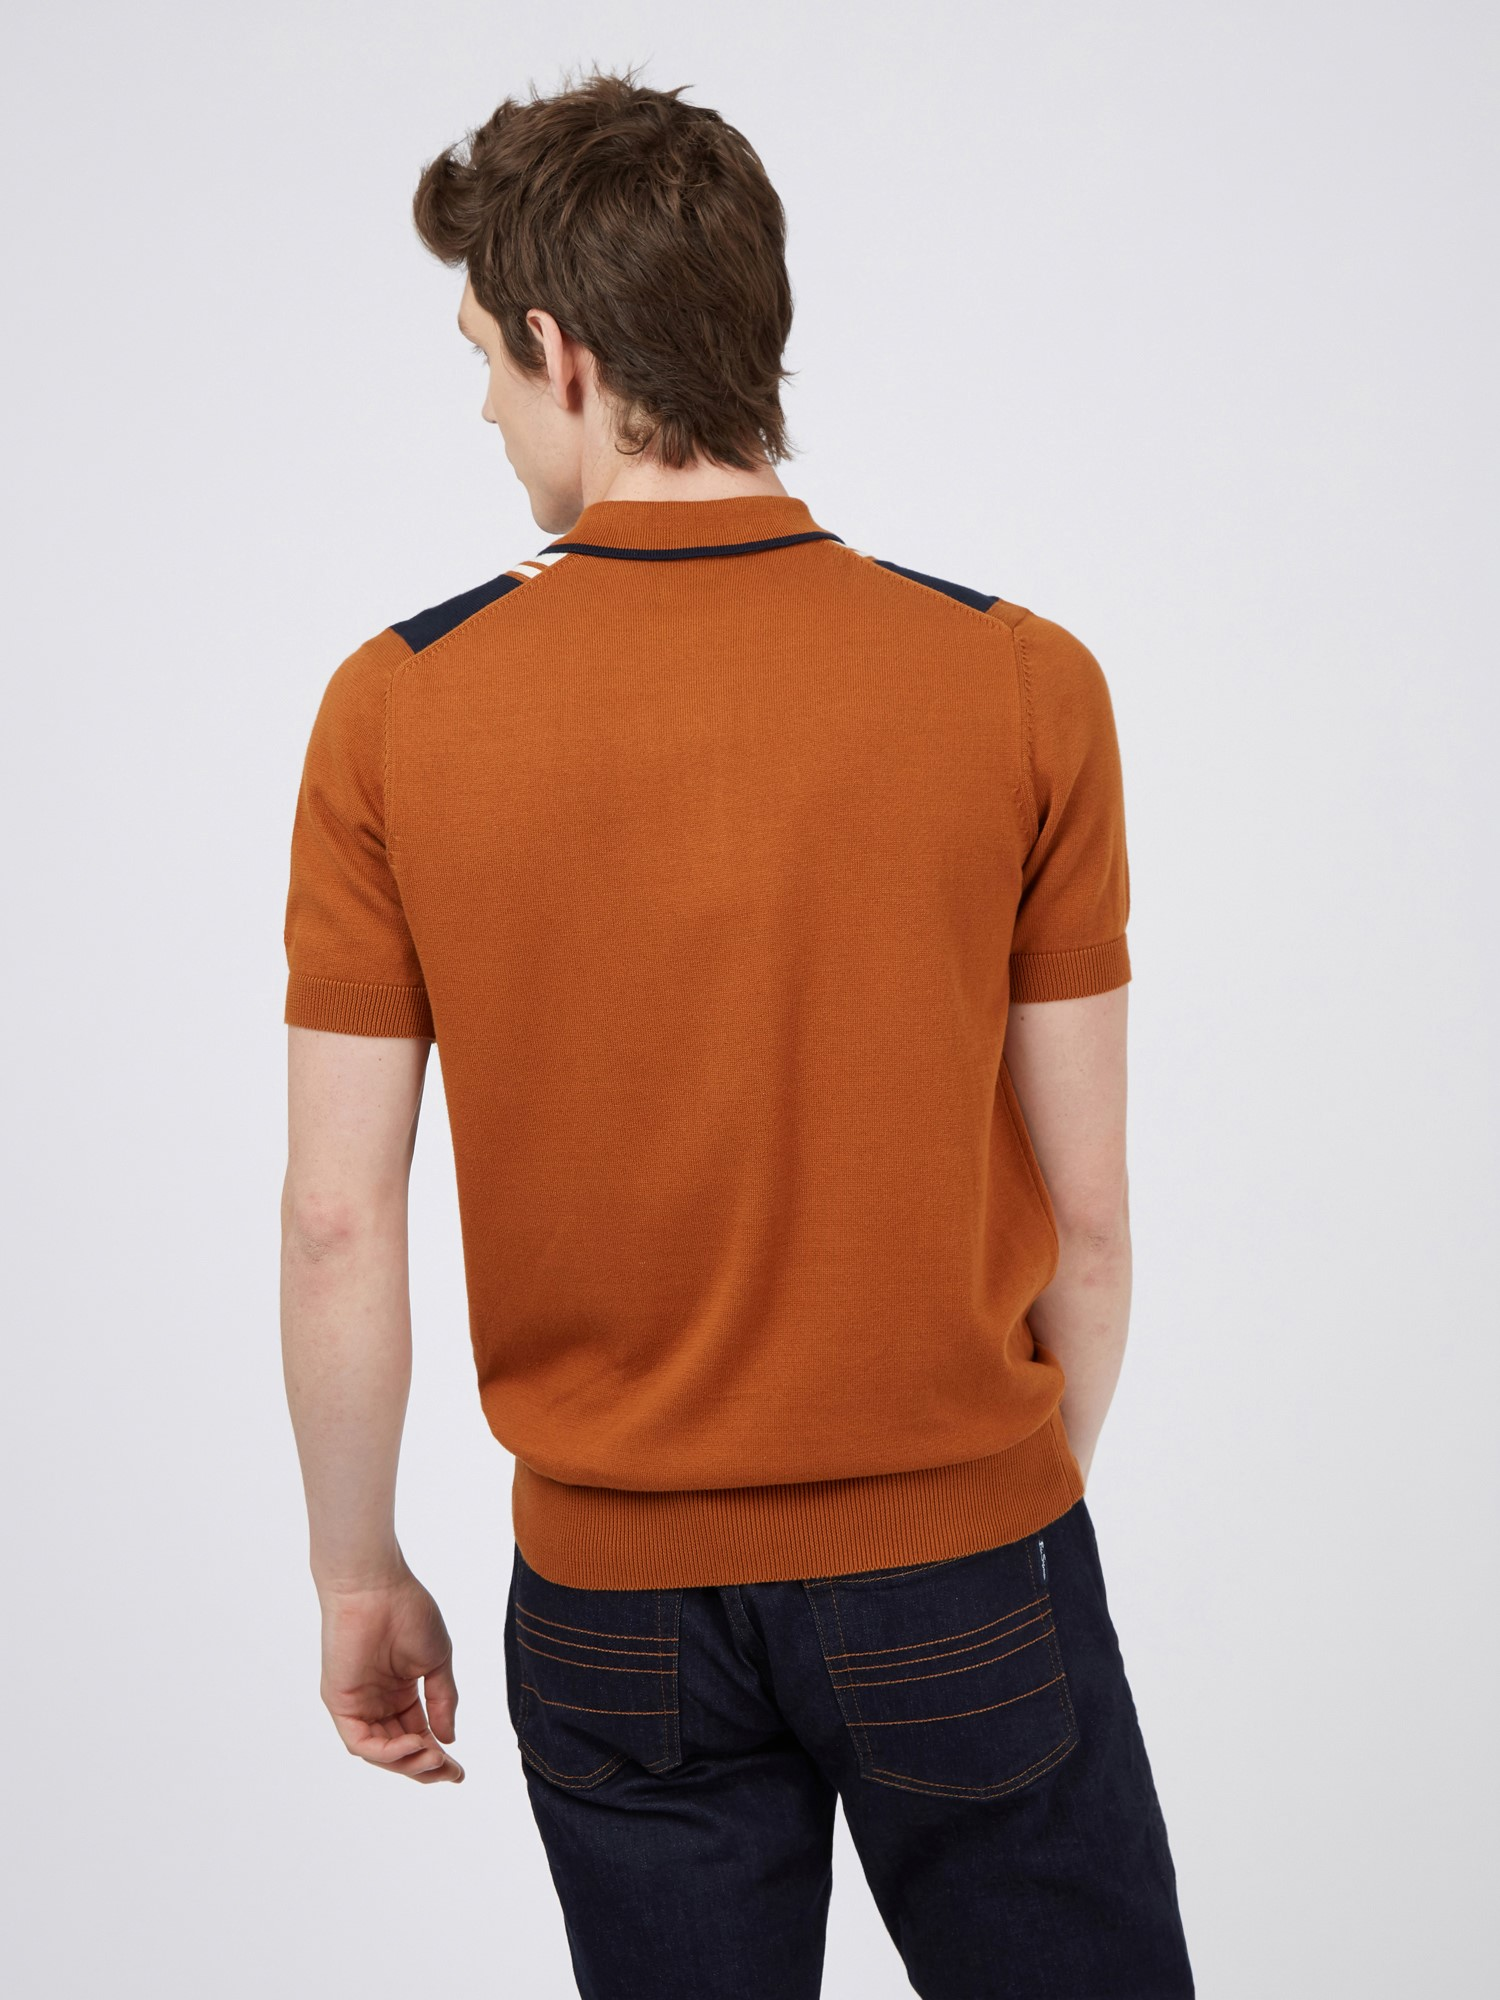 Caramel Mod Stripe Knitted Polo Shirt